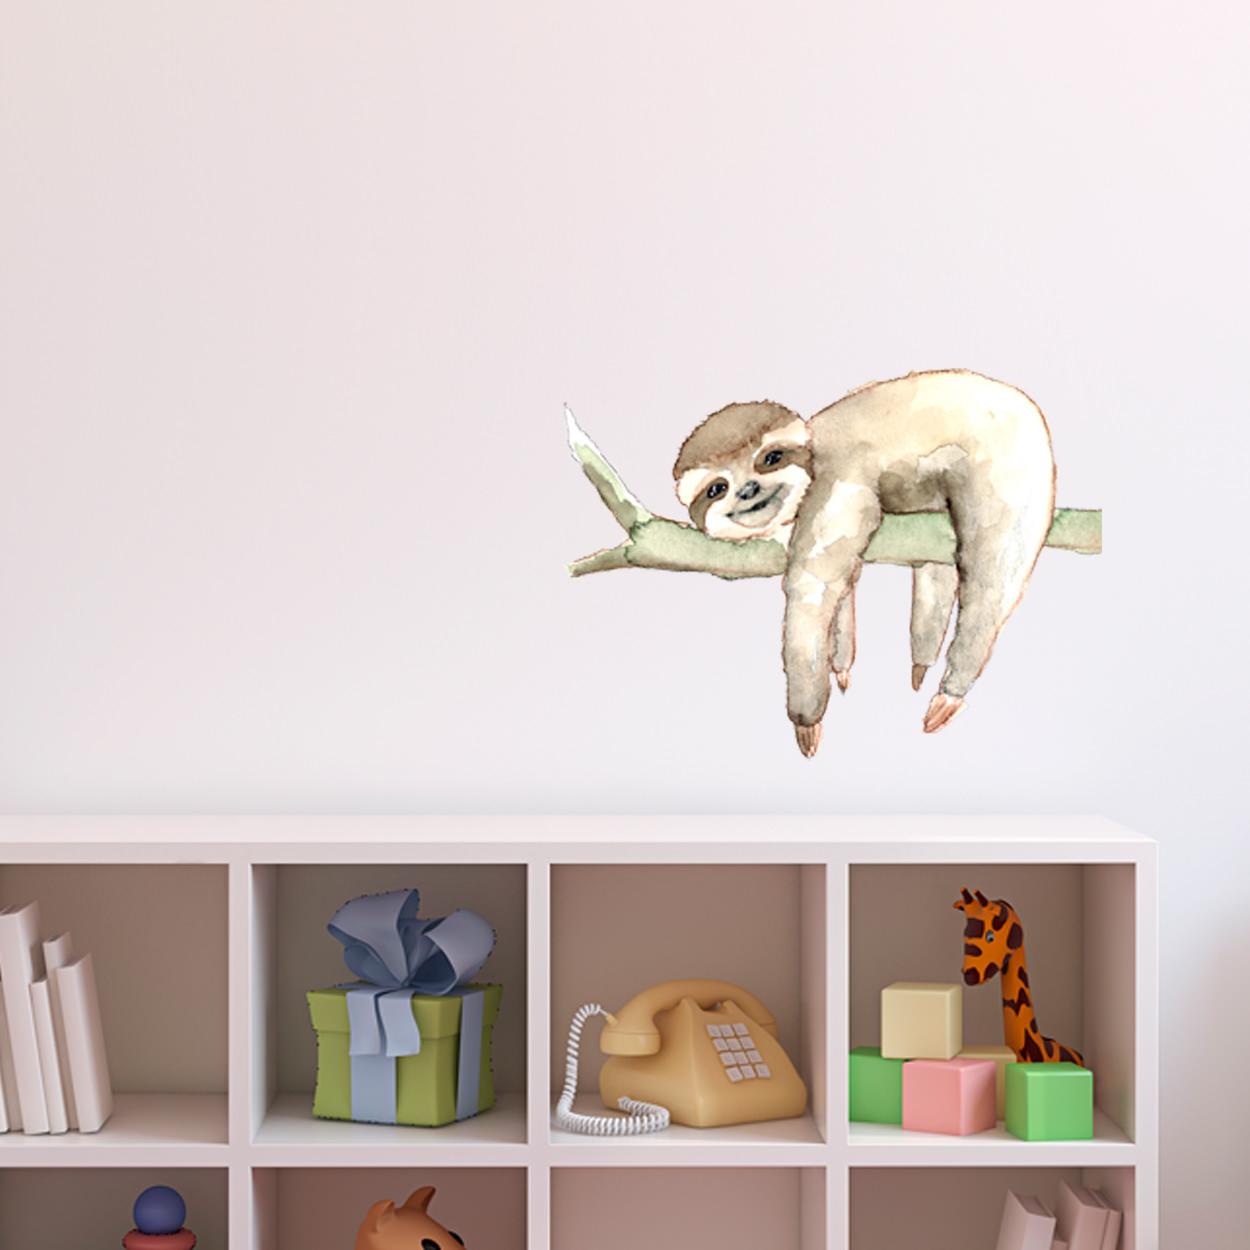 Wandtattoo Aufkleber Wandsticker Faultier sloth be lazy